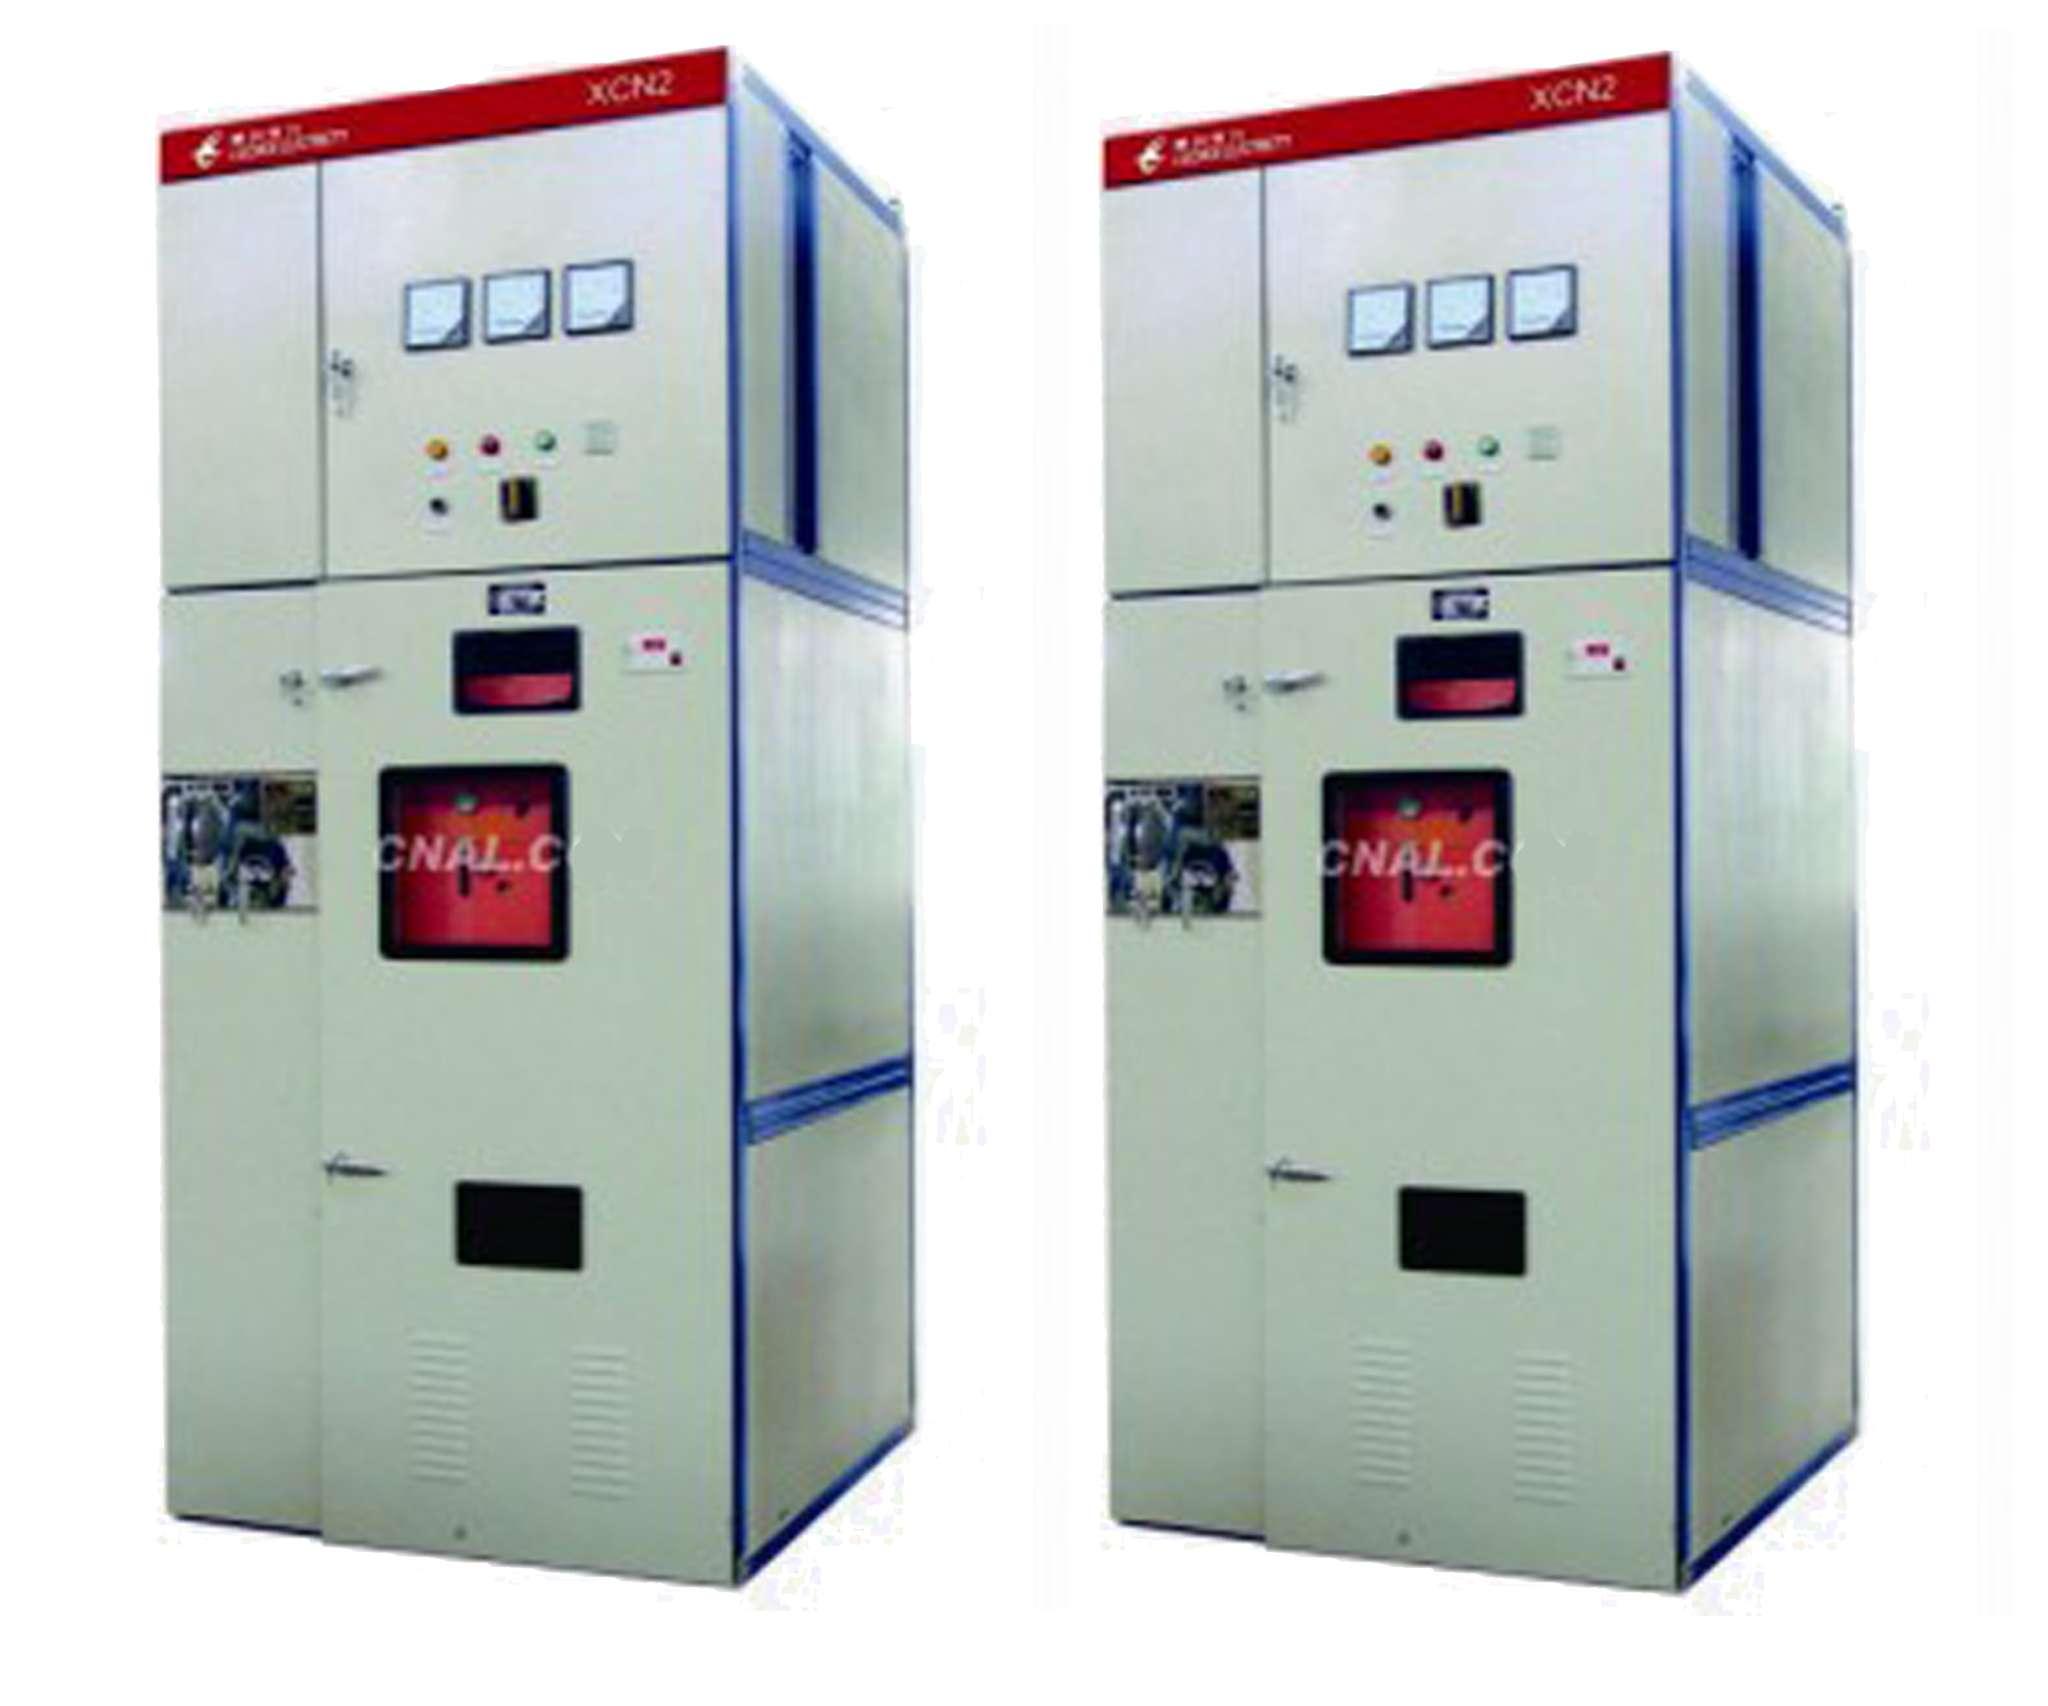 xgn2高压配电柜 - 新疆友邦莱登成套电气有限公司